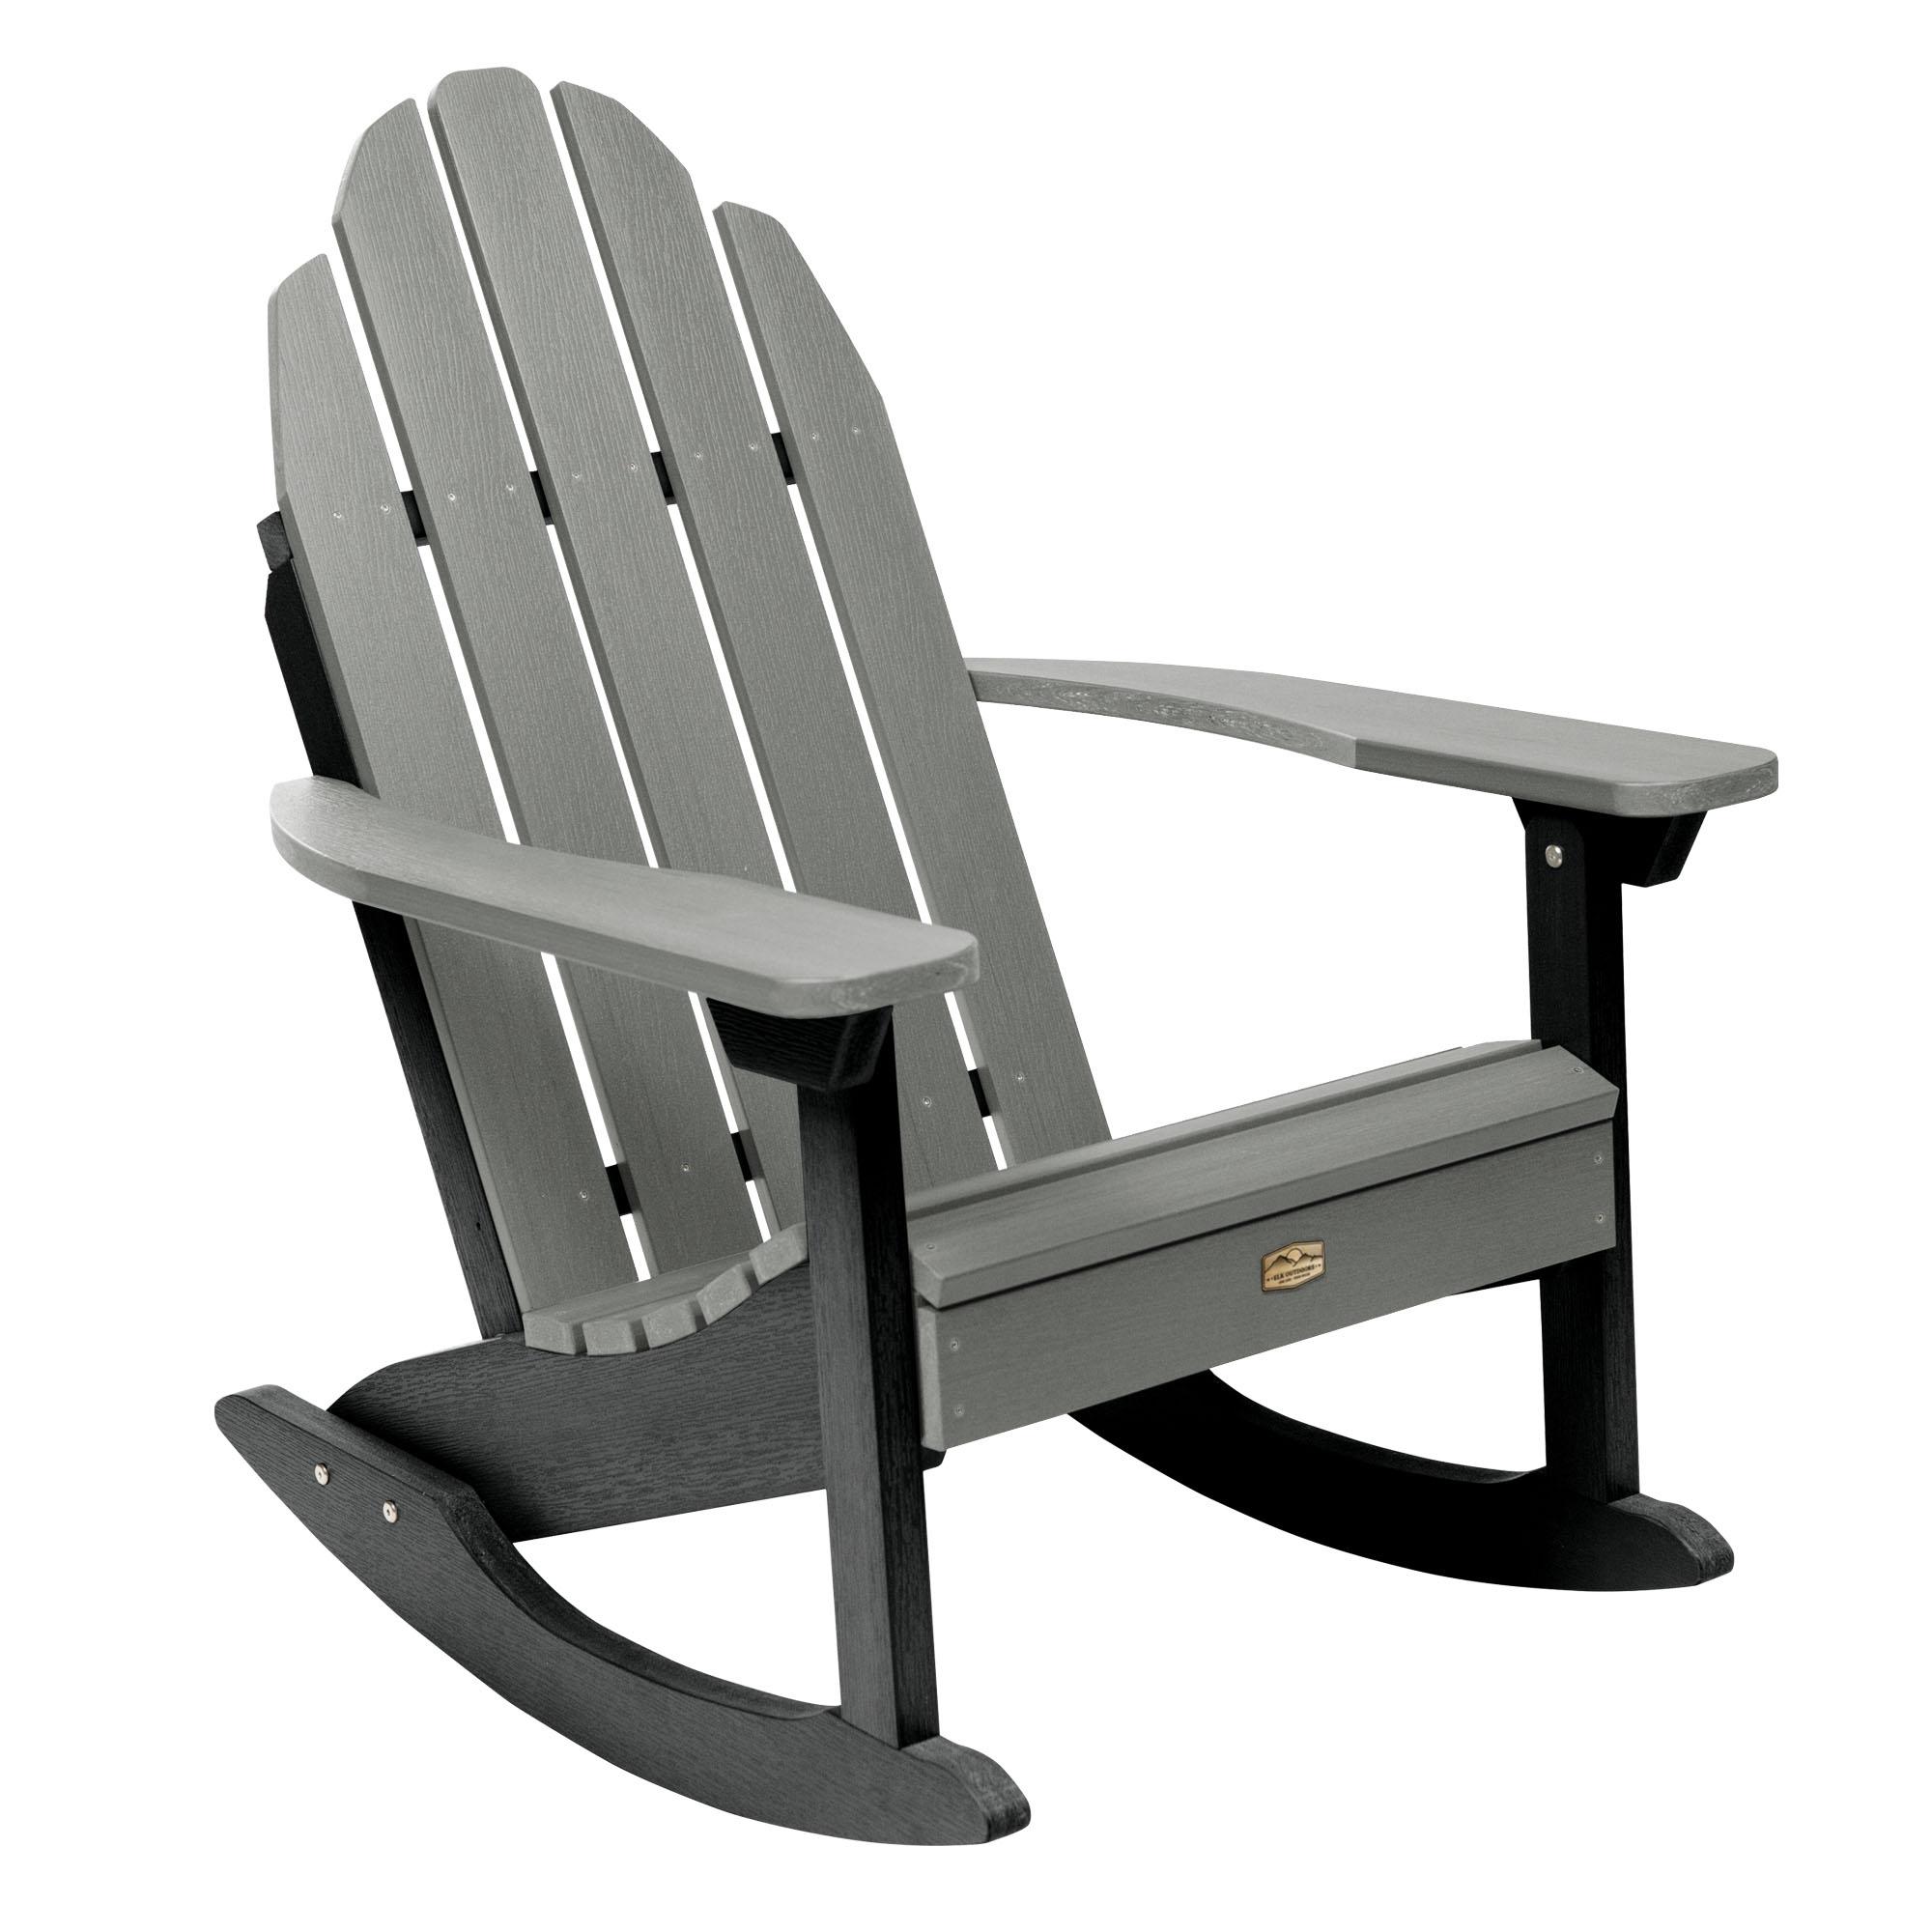 The Essential Adirondack Rocking Chair